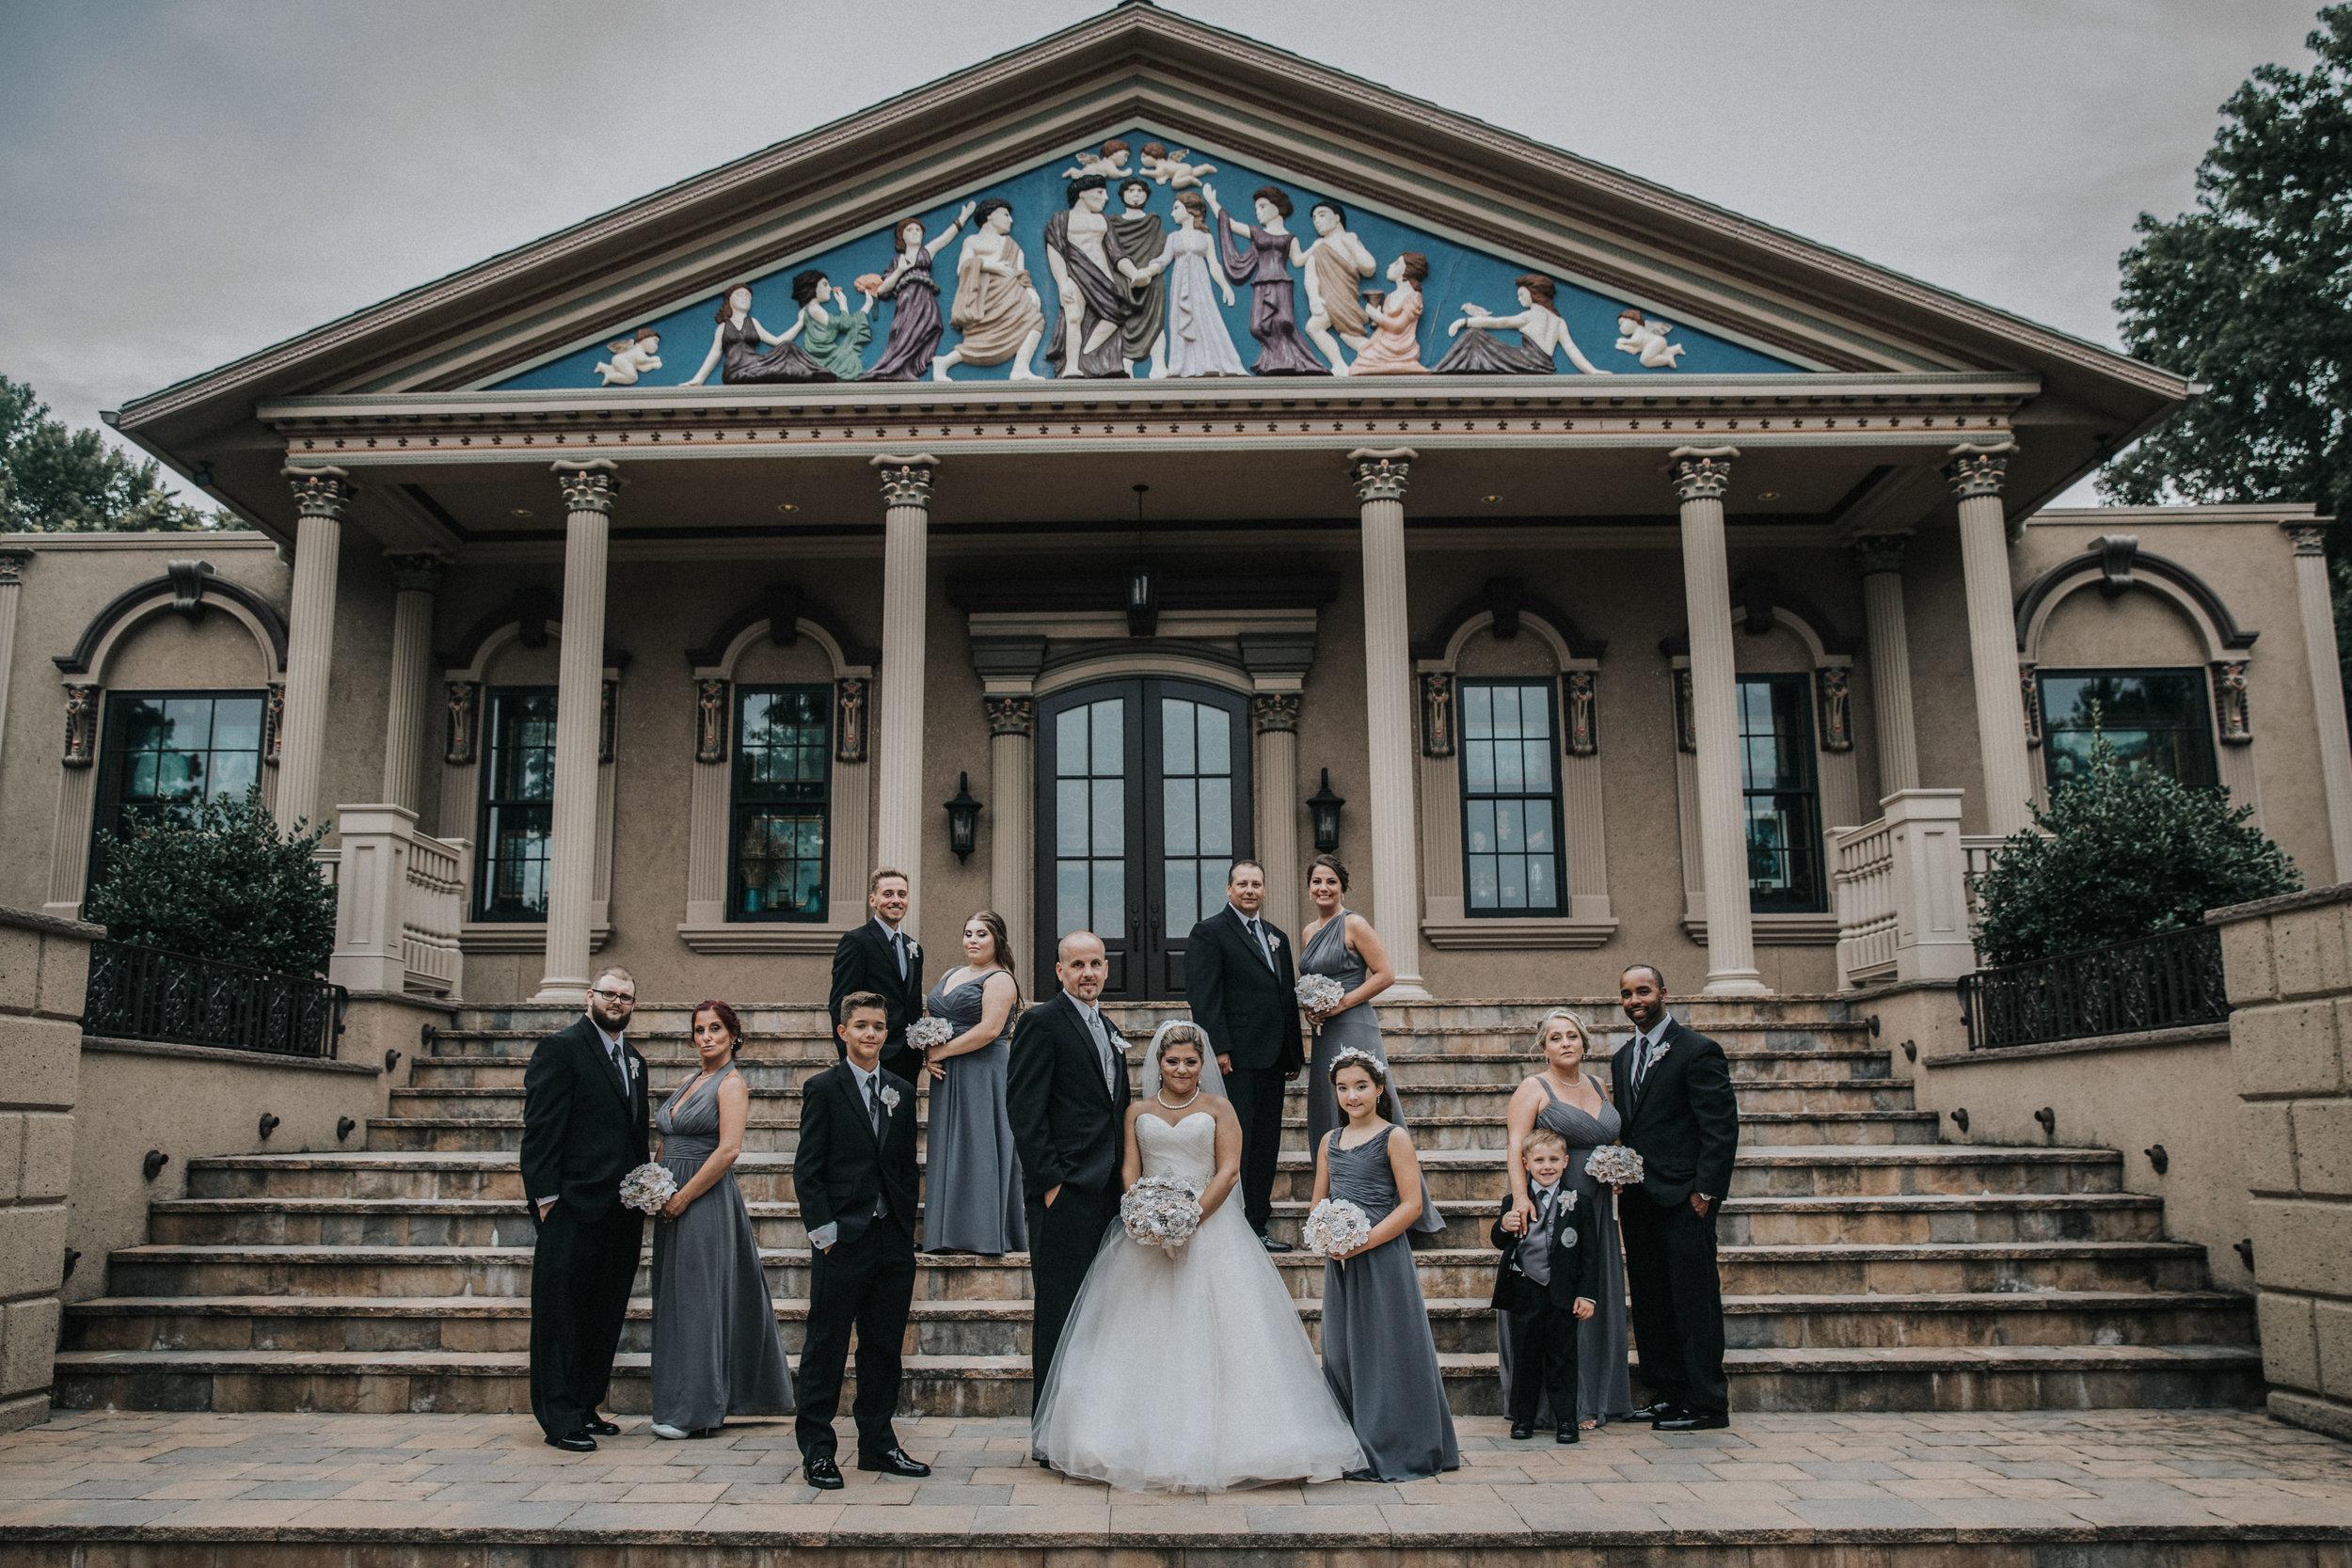 NewJersey_Wedding_Photography_Brigalias_Bridal_Party_Tara&Pete-46.jpg